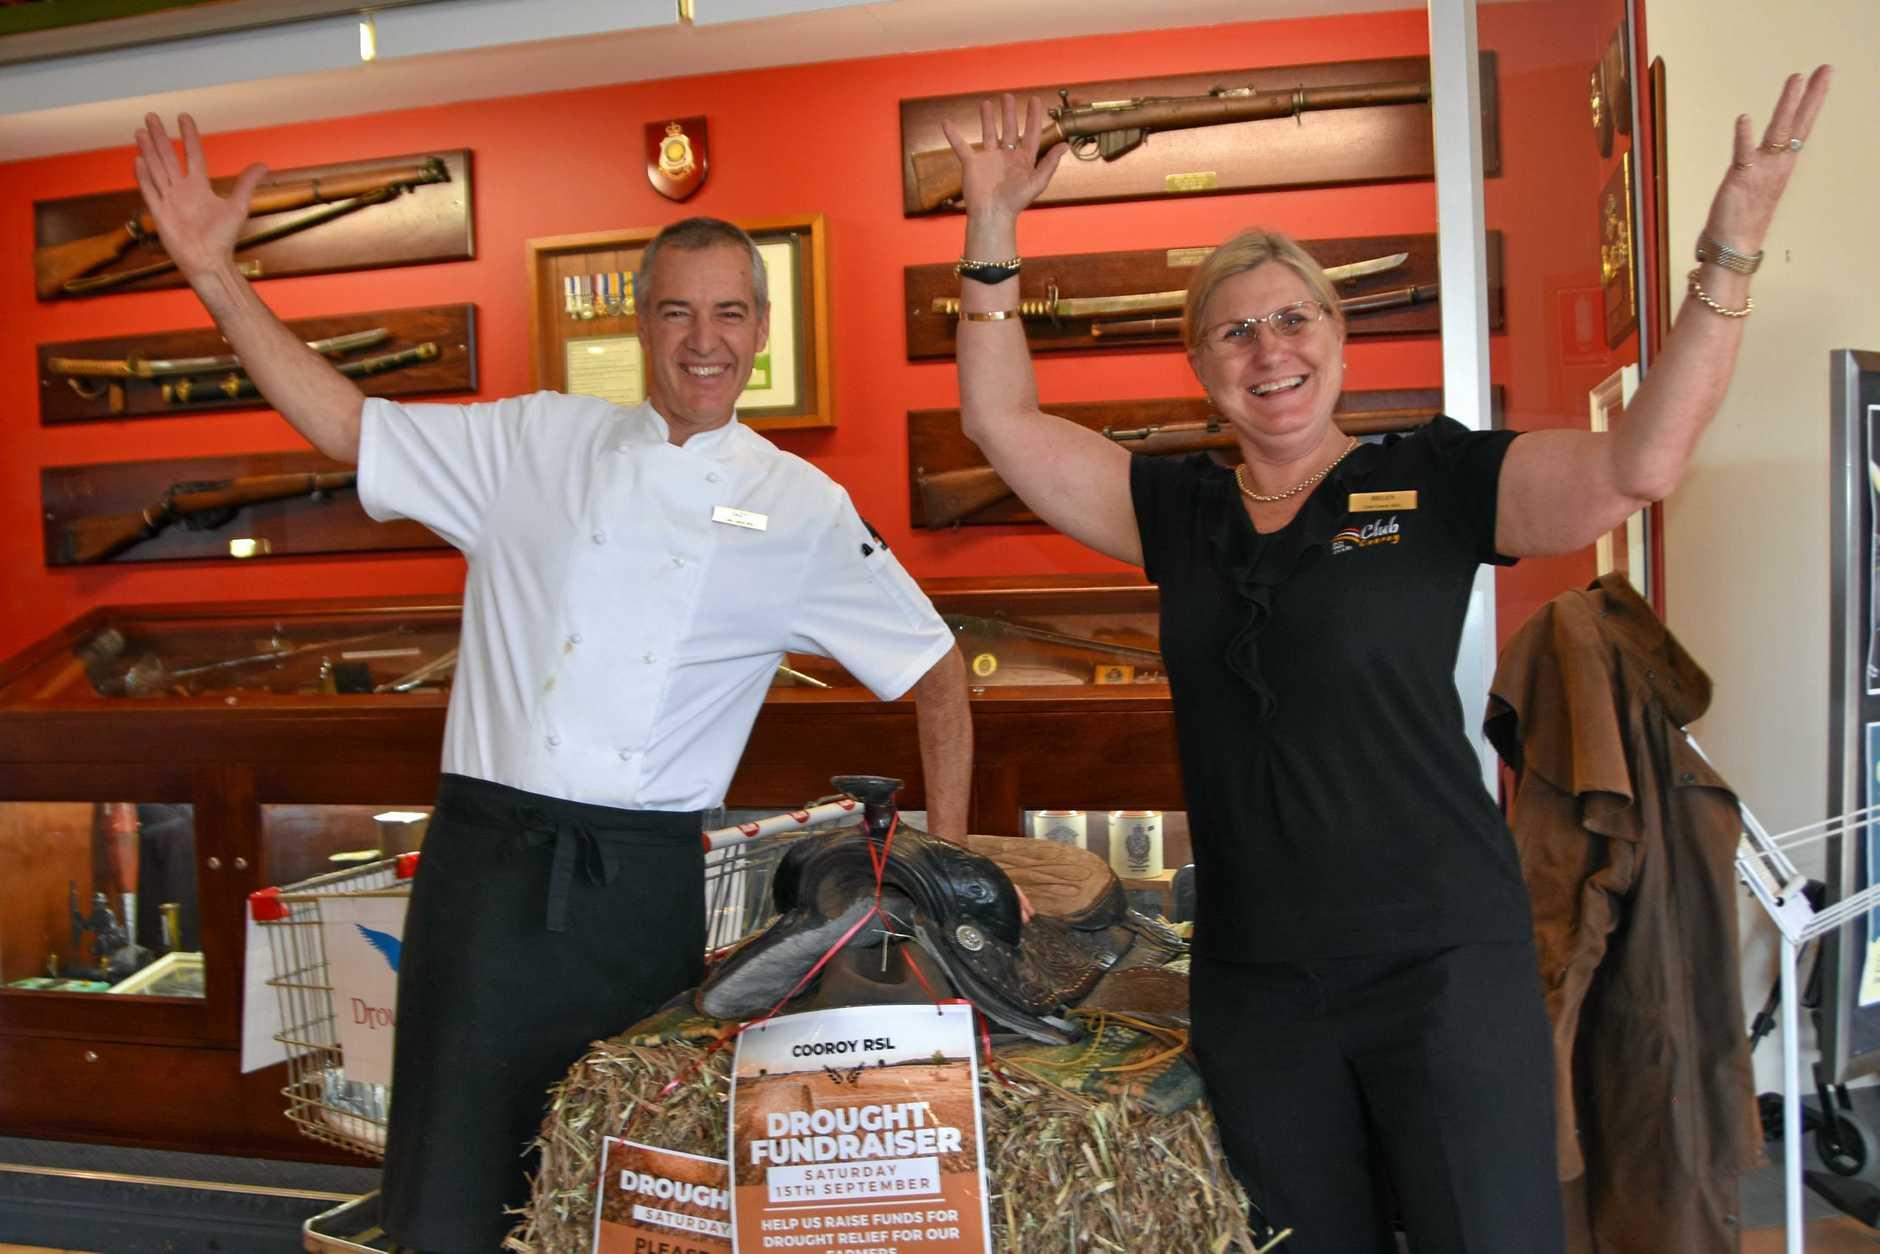 DINNER READY: Cooroy RSL head chef Brett Duke and operations manager Helen Hollingworth.